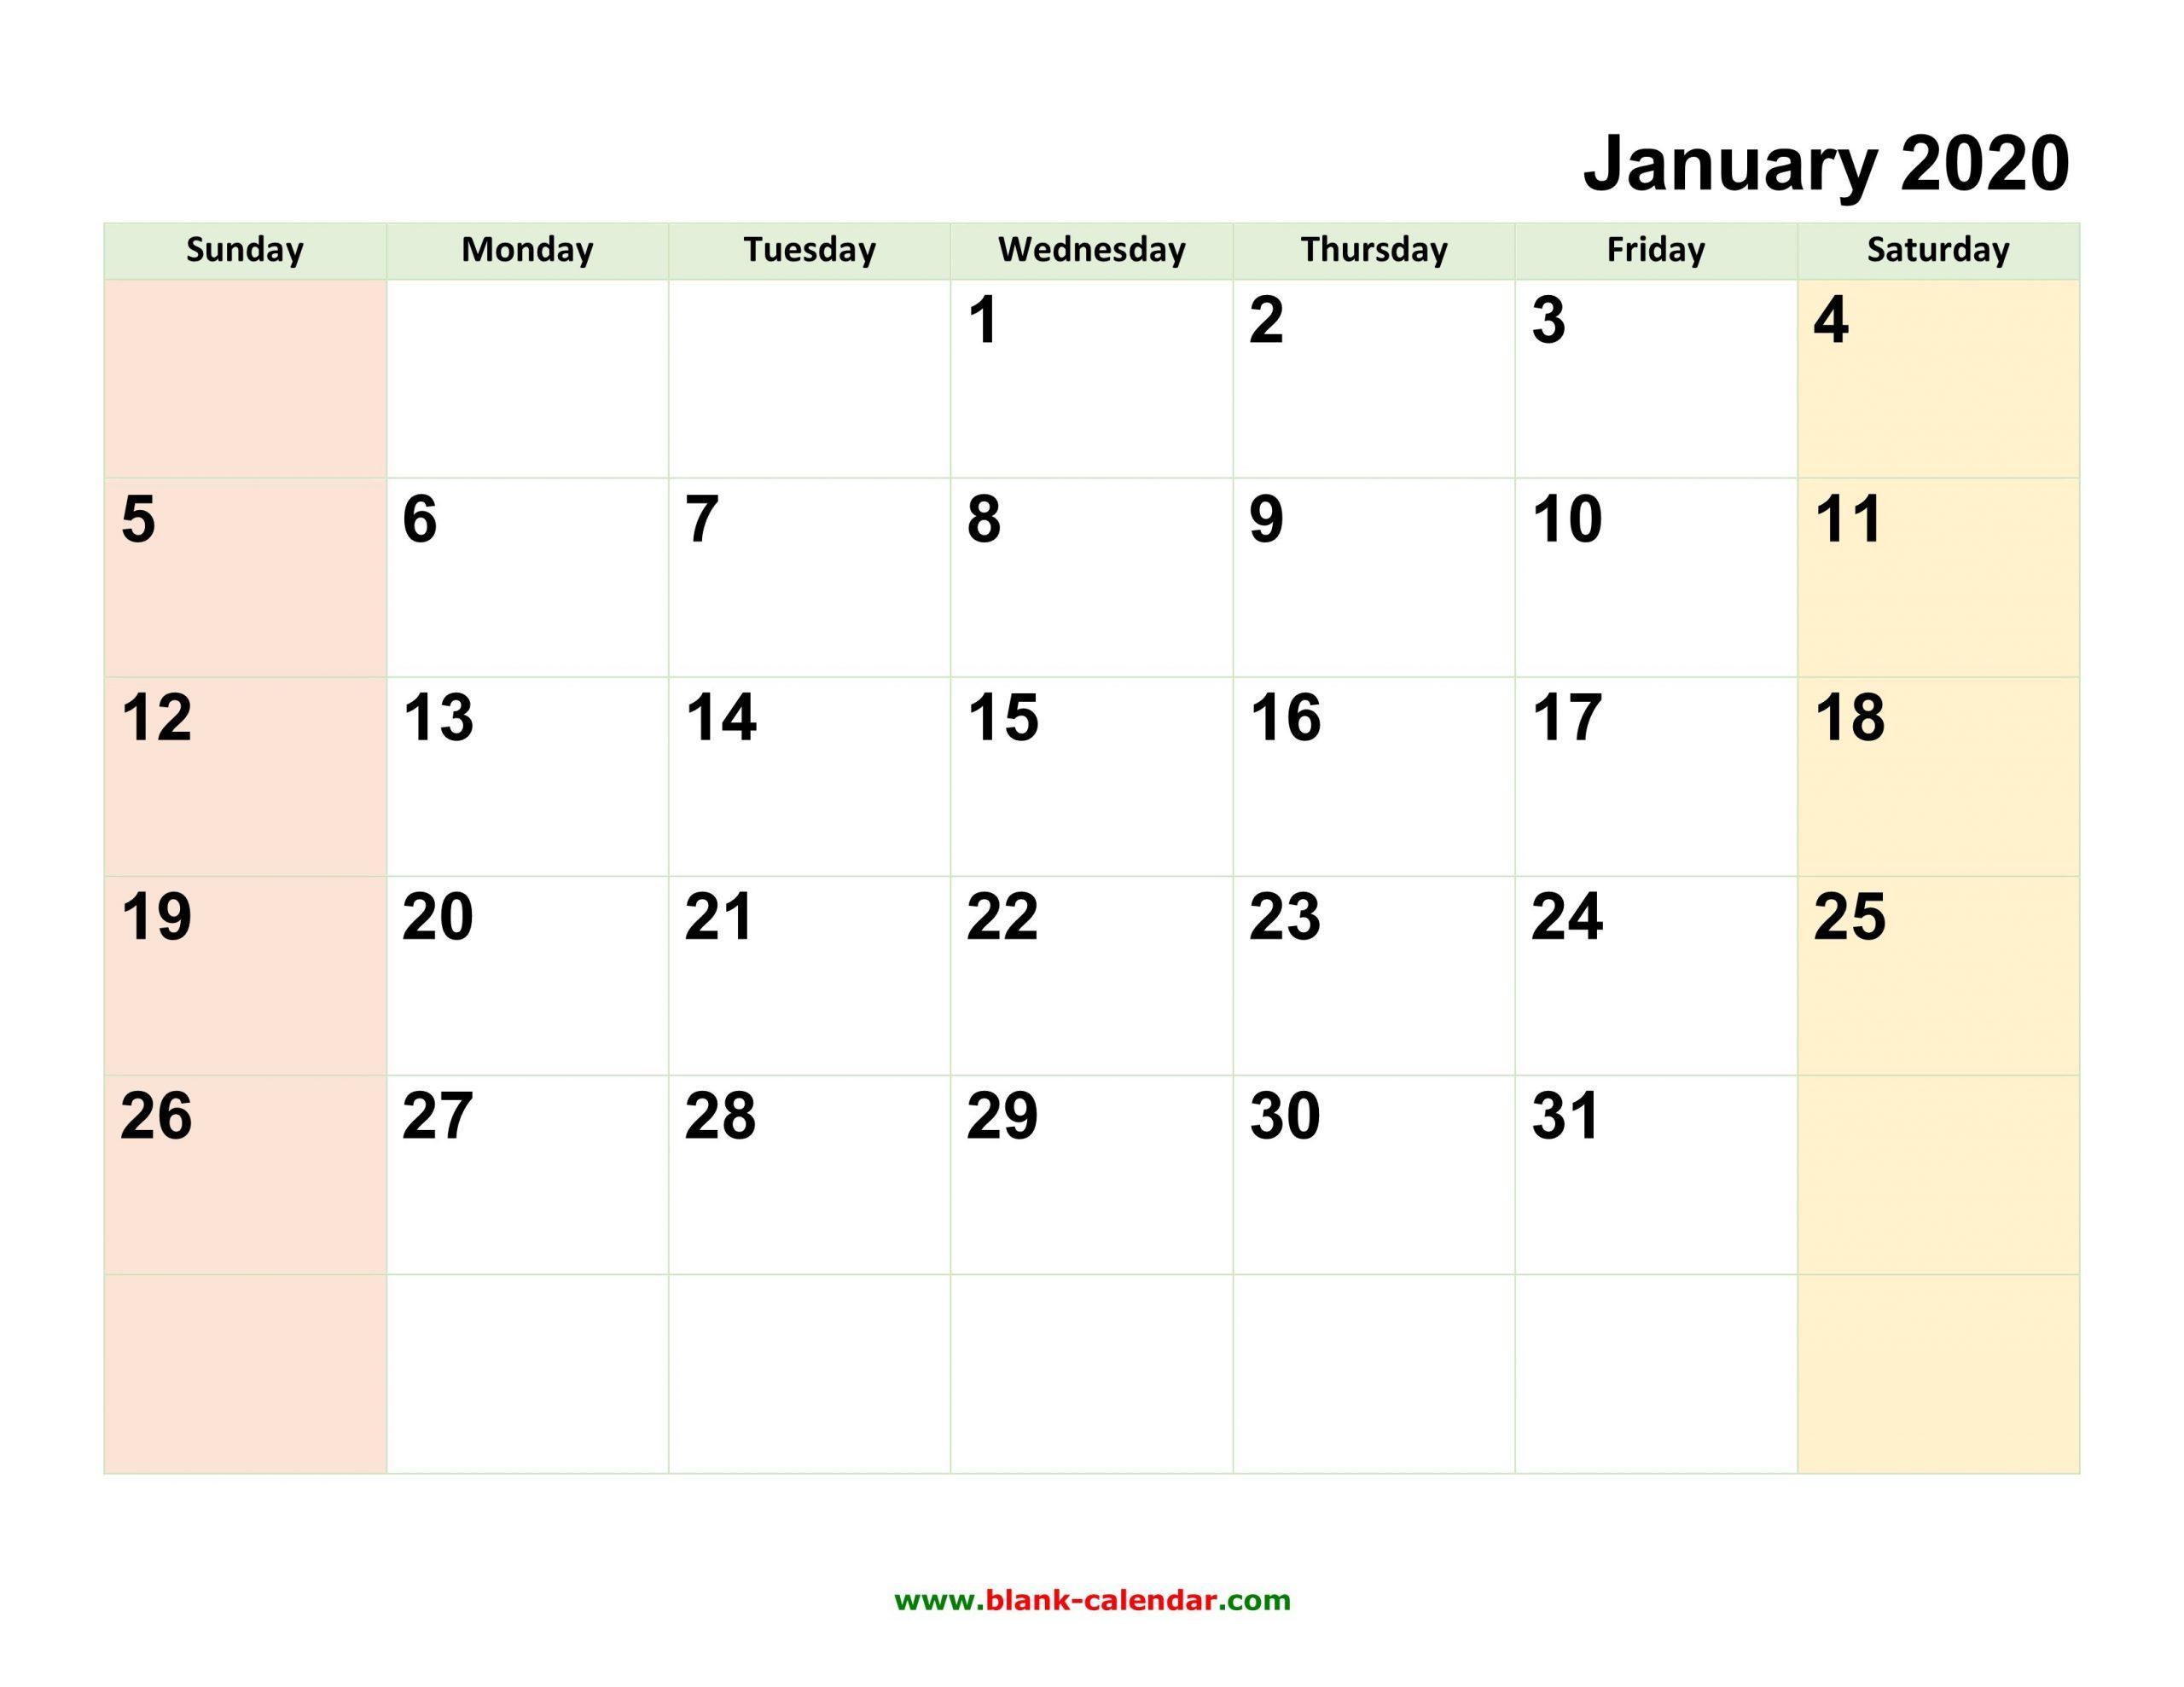 2020 Calendar You Can Edit | Calendar Template Printable Free Calendar You Can Edit